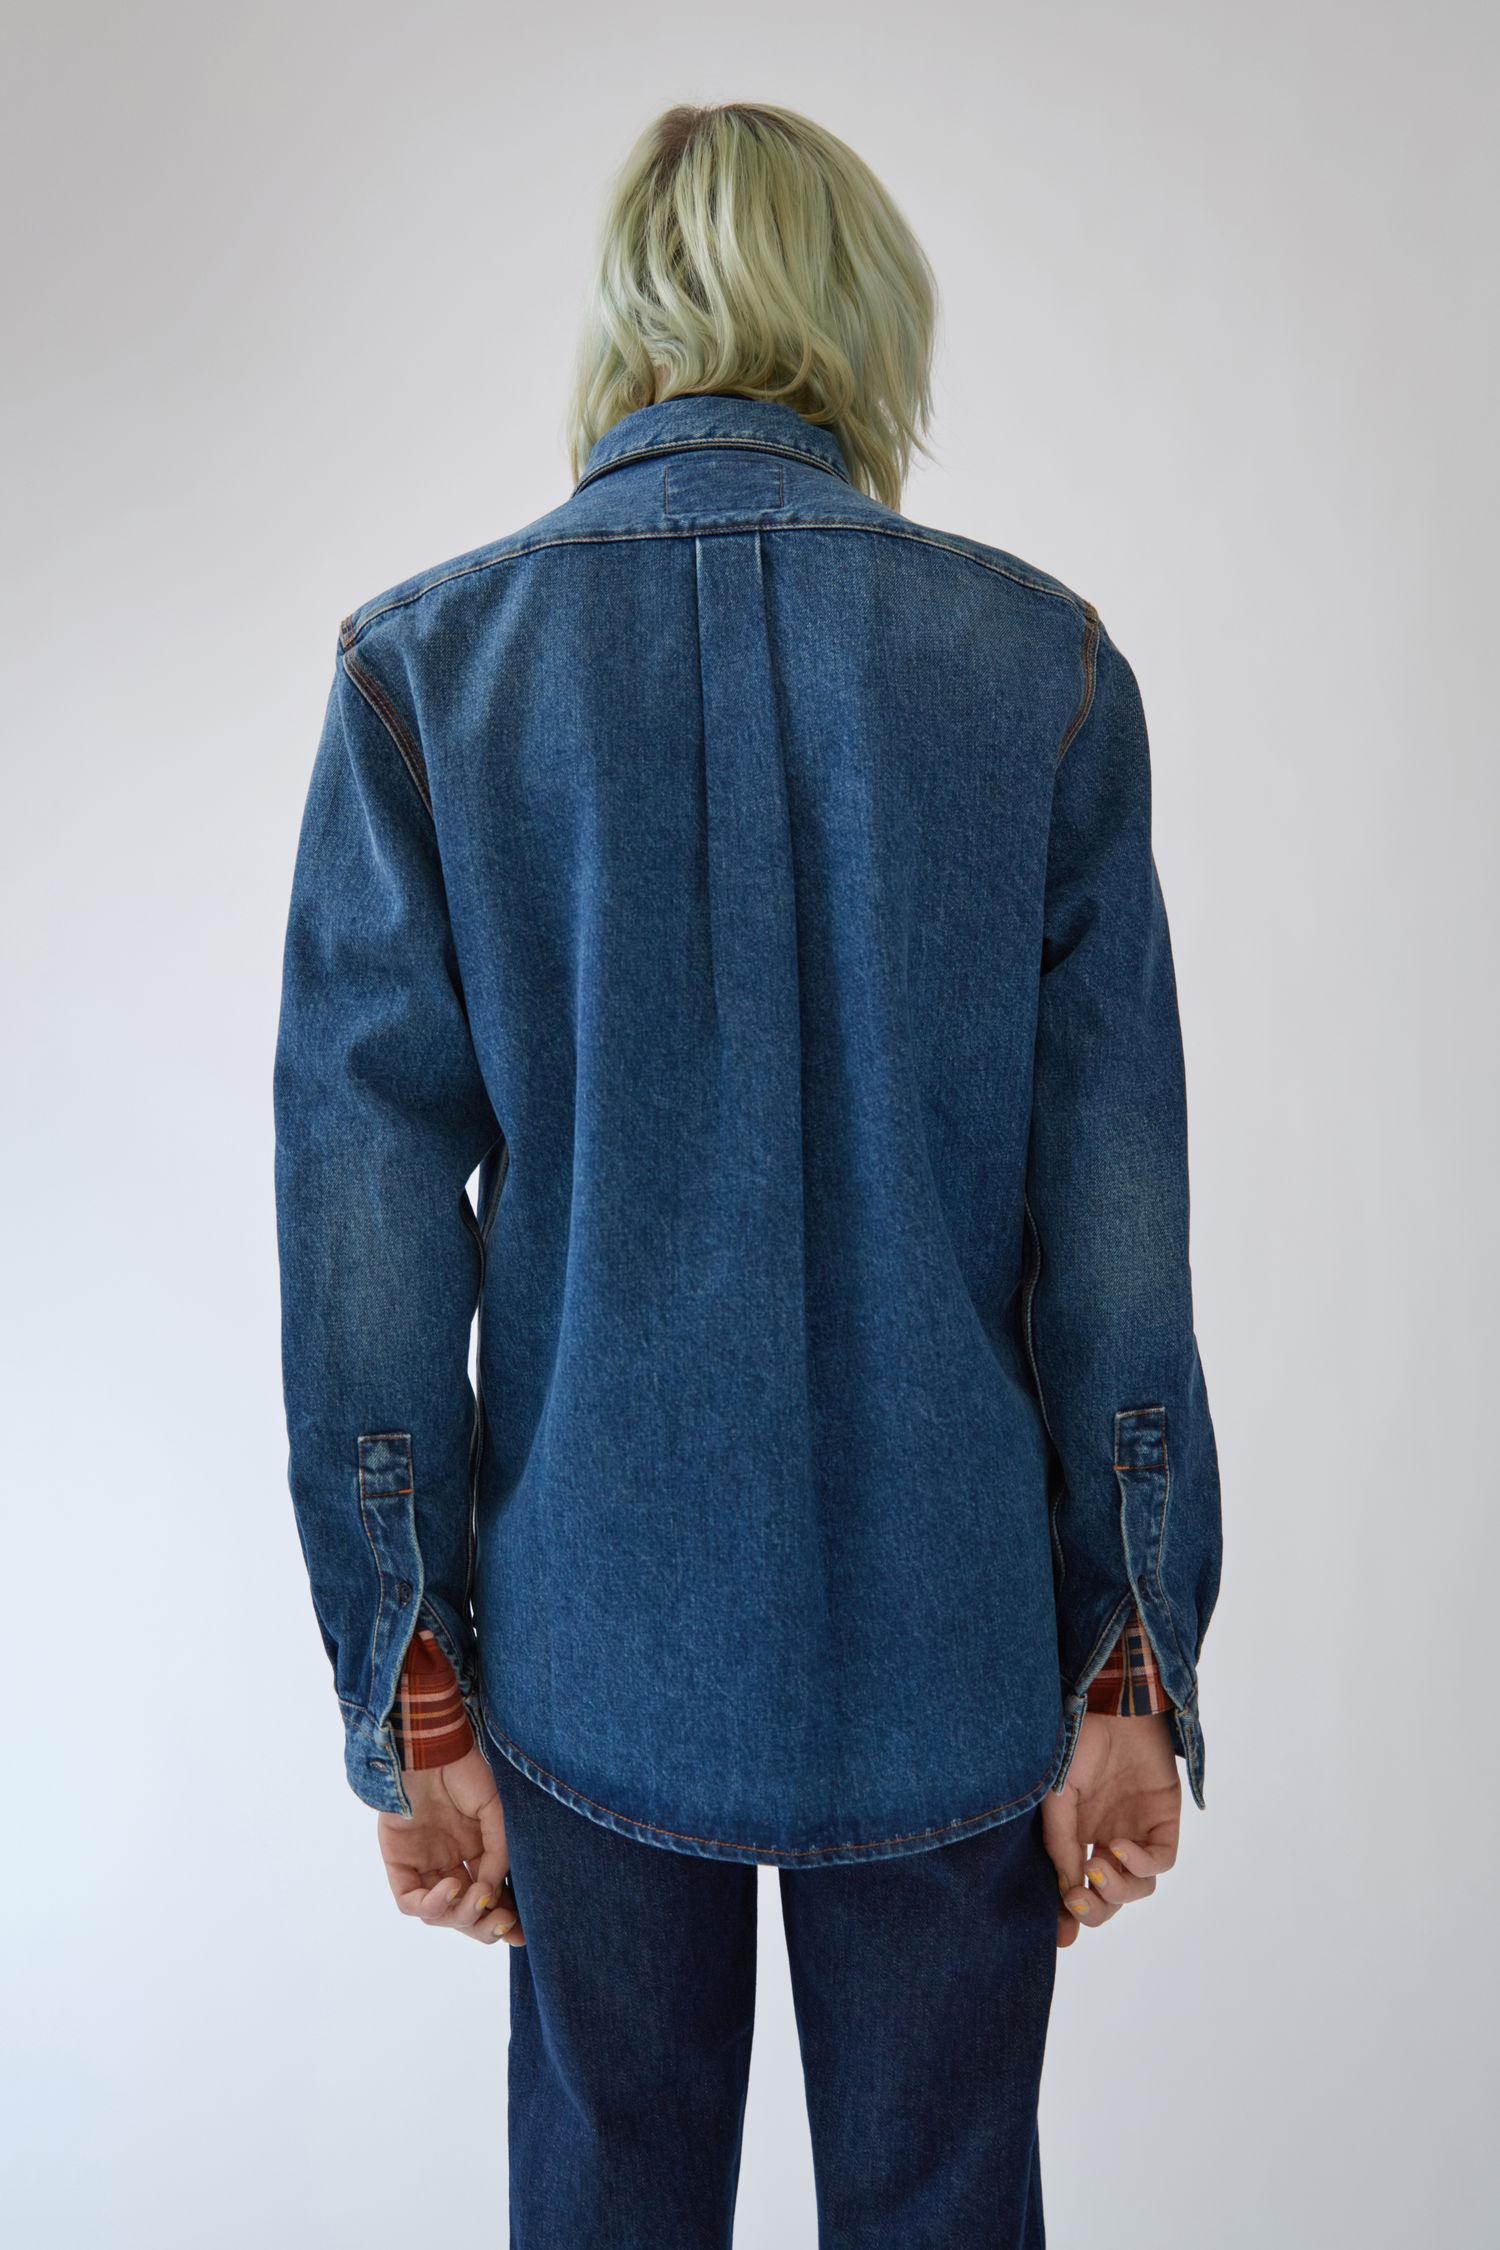 Acne Studios Denim Classic Shirt mid Vintage in Blue for Men